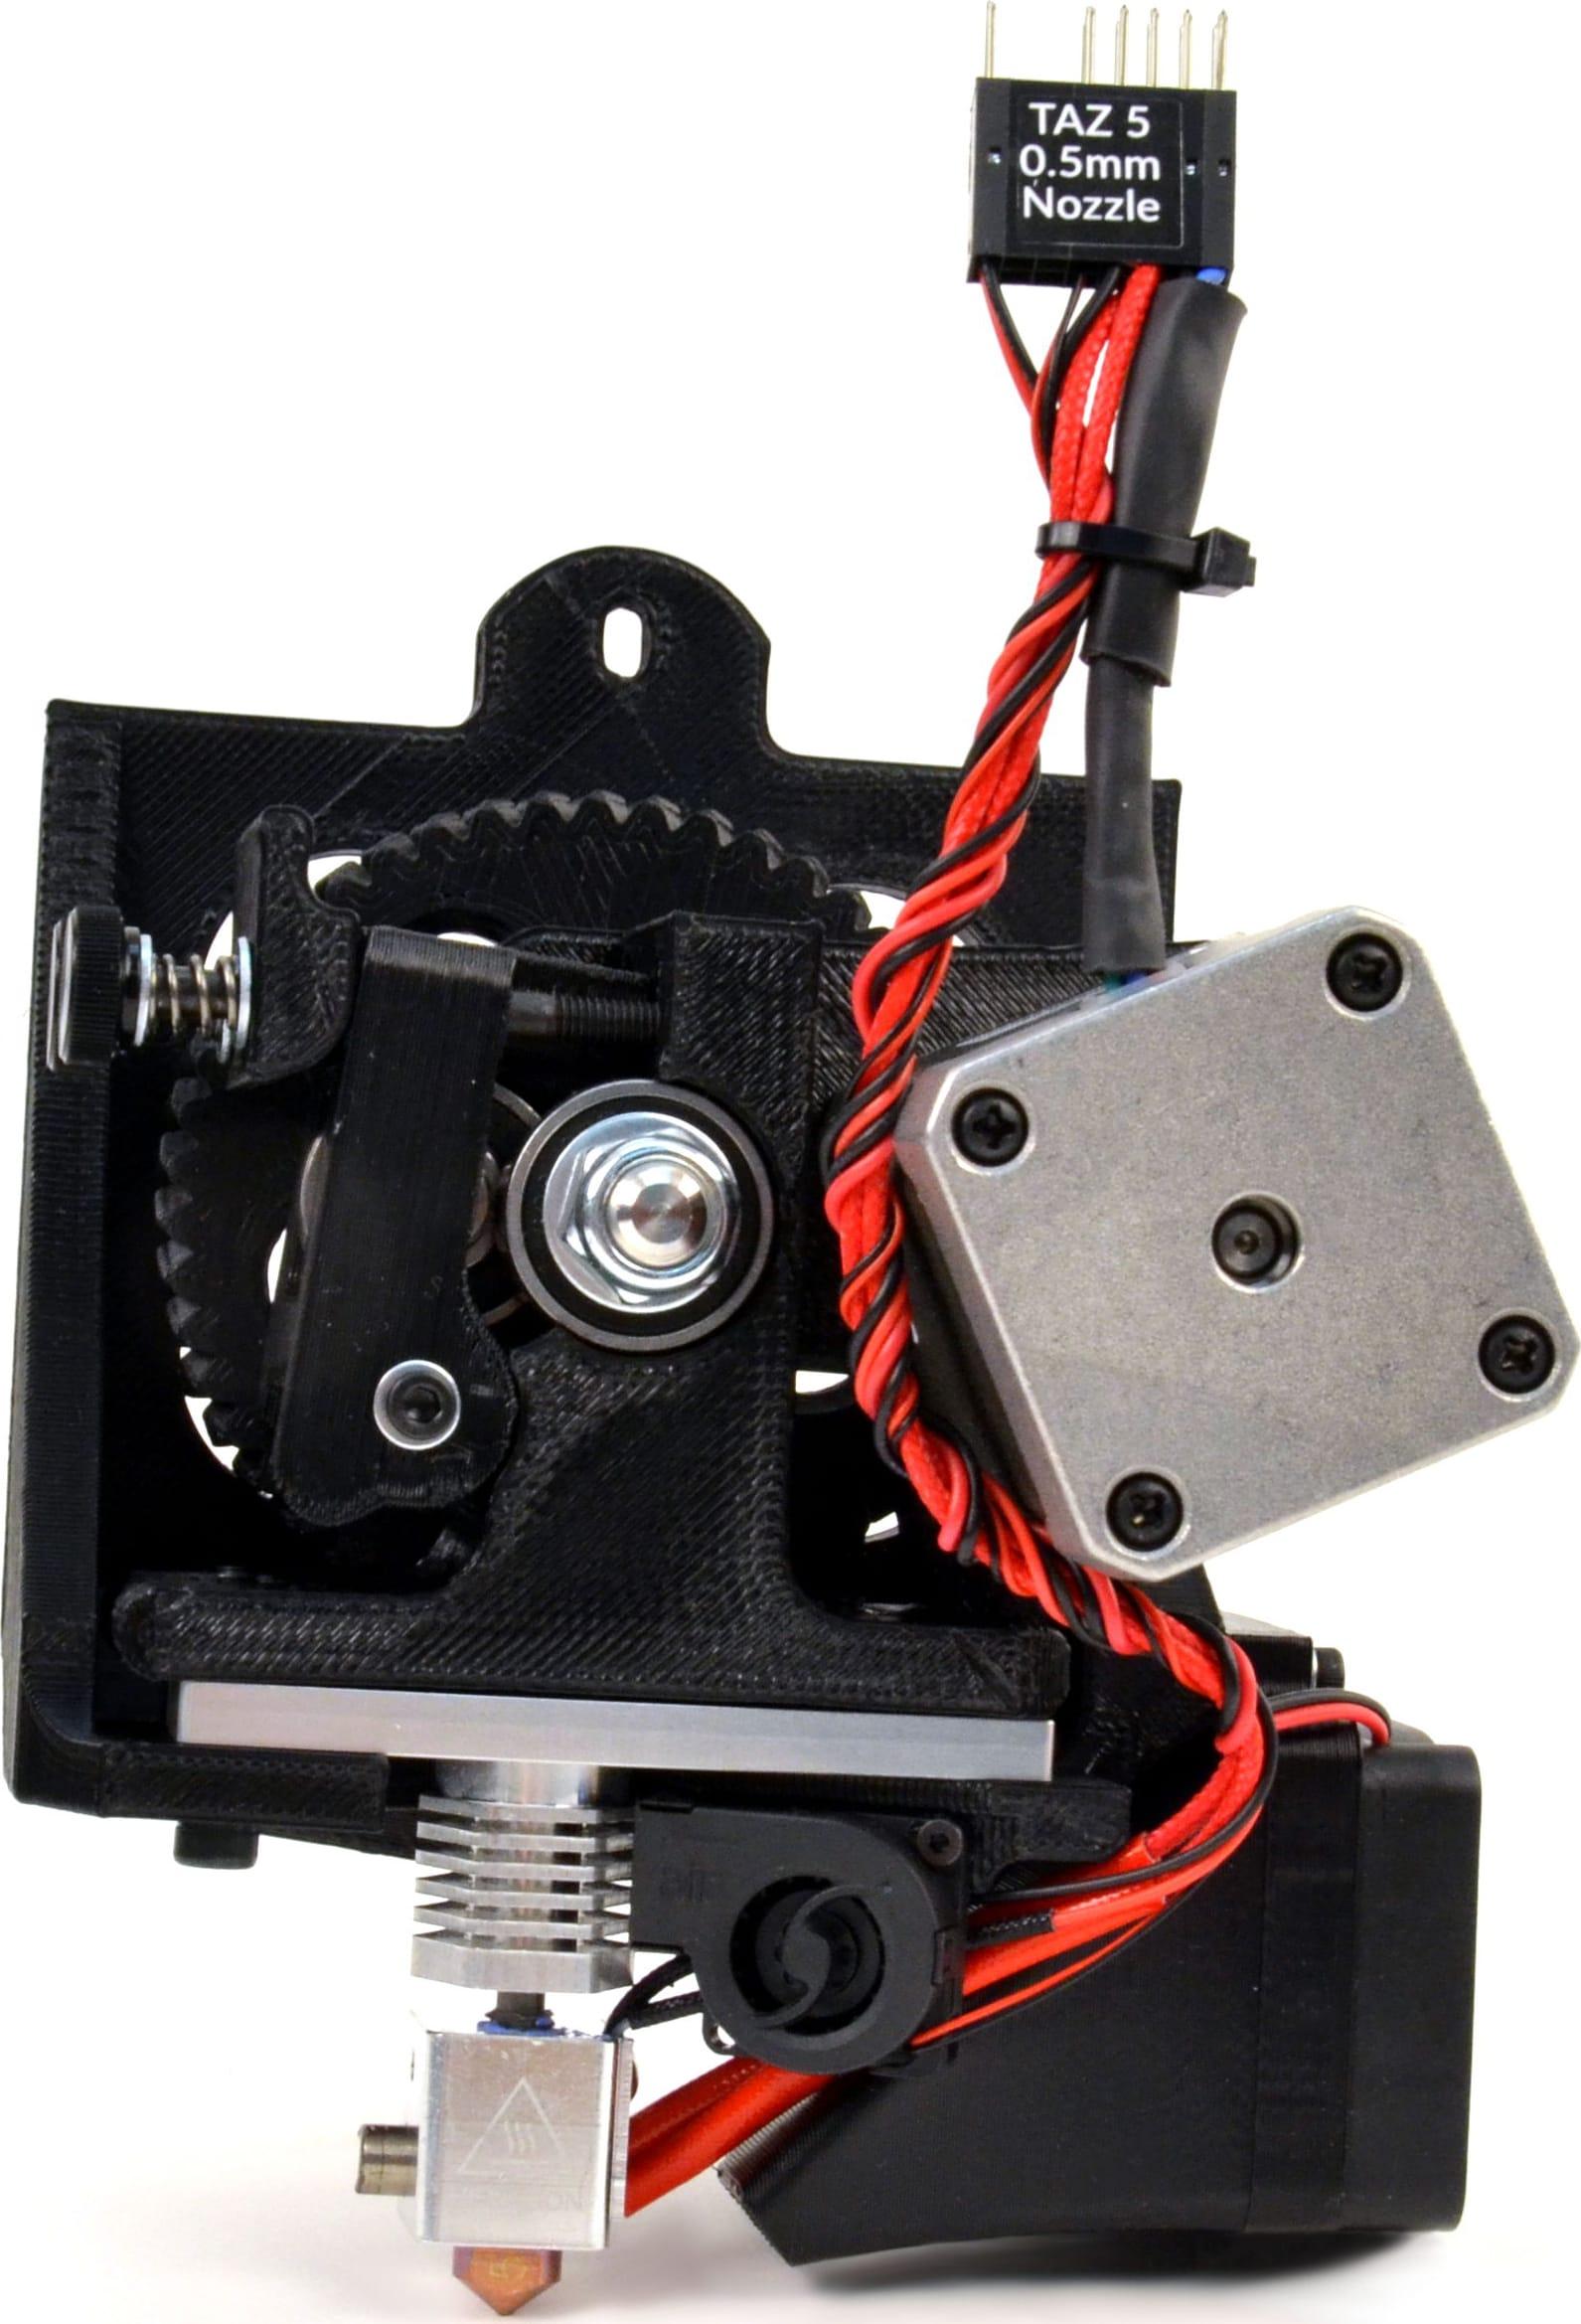 Lulzbot KT-CP0095 LulzBot TAZ Single Extruder Tool Head v2c, 0.35mm Nozzle